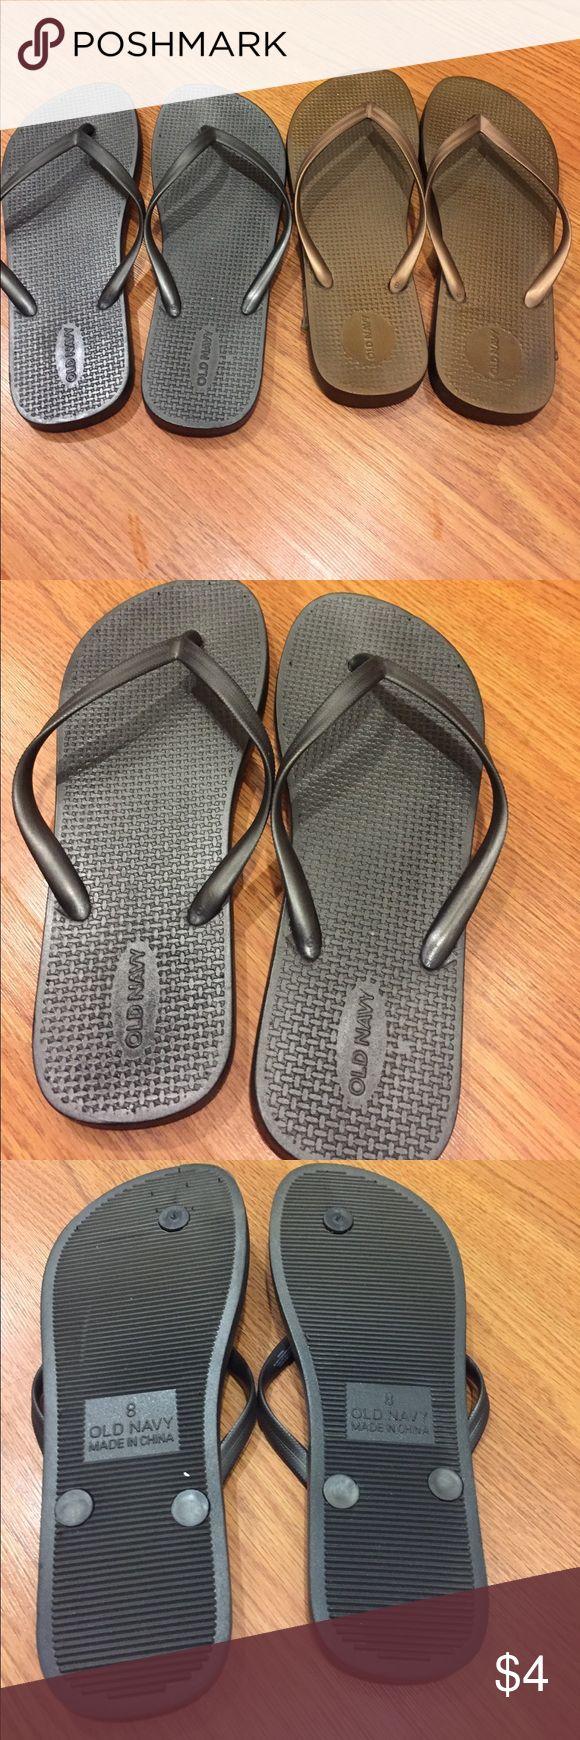 Black sandals old navy - 2 Pair Of Metallic Old Navy Flip Flops Size 8 Metallic Grey And Metallic Gold Old